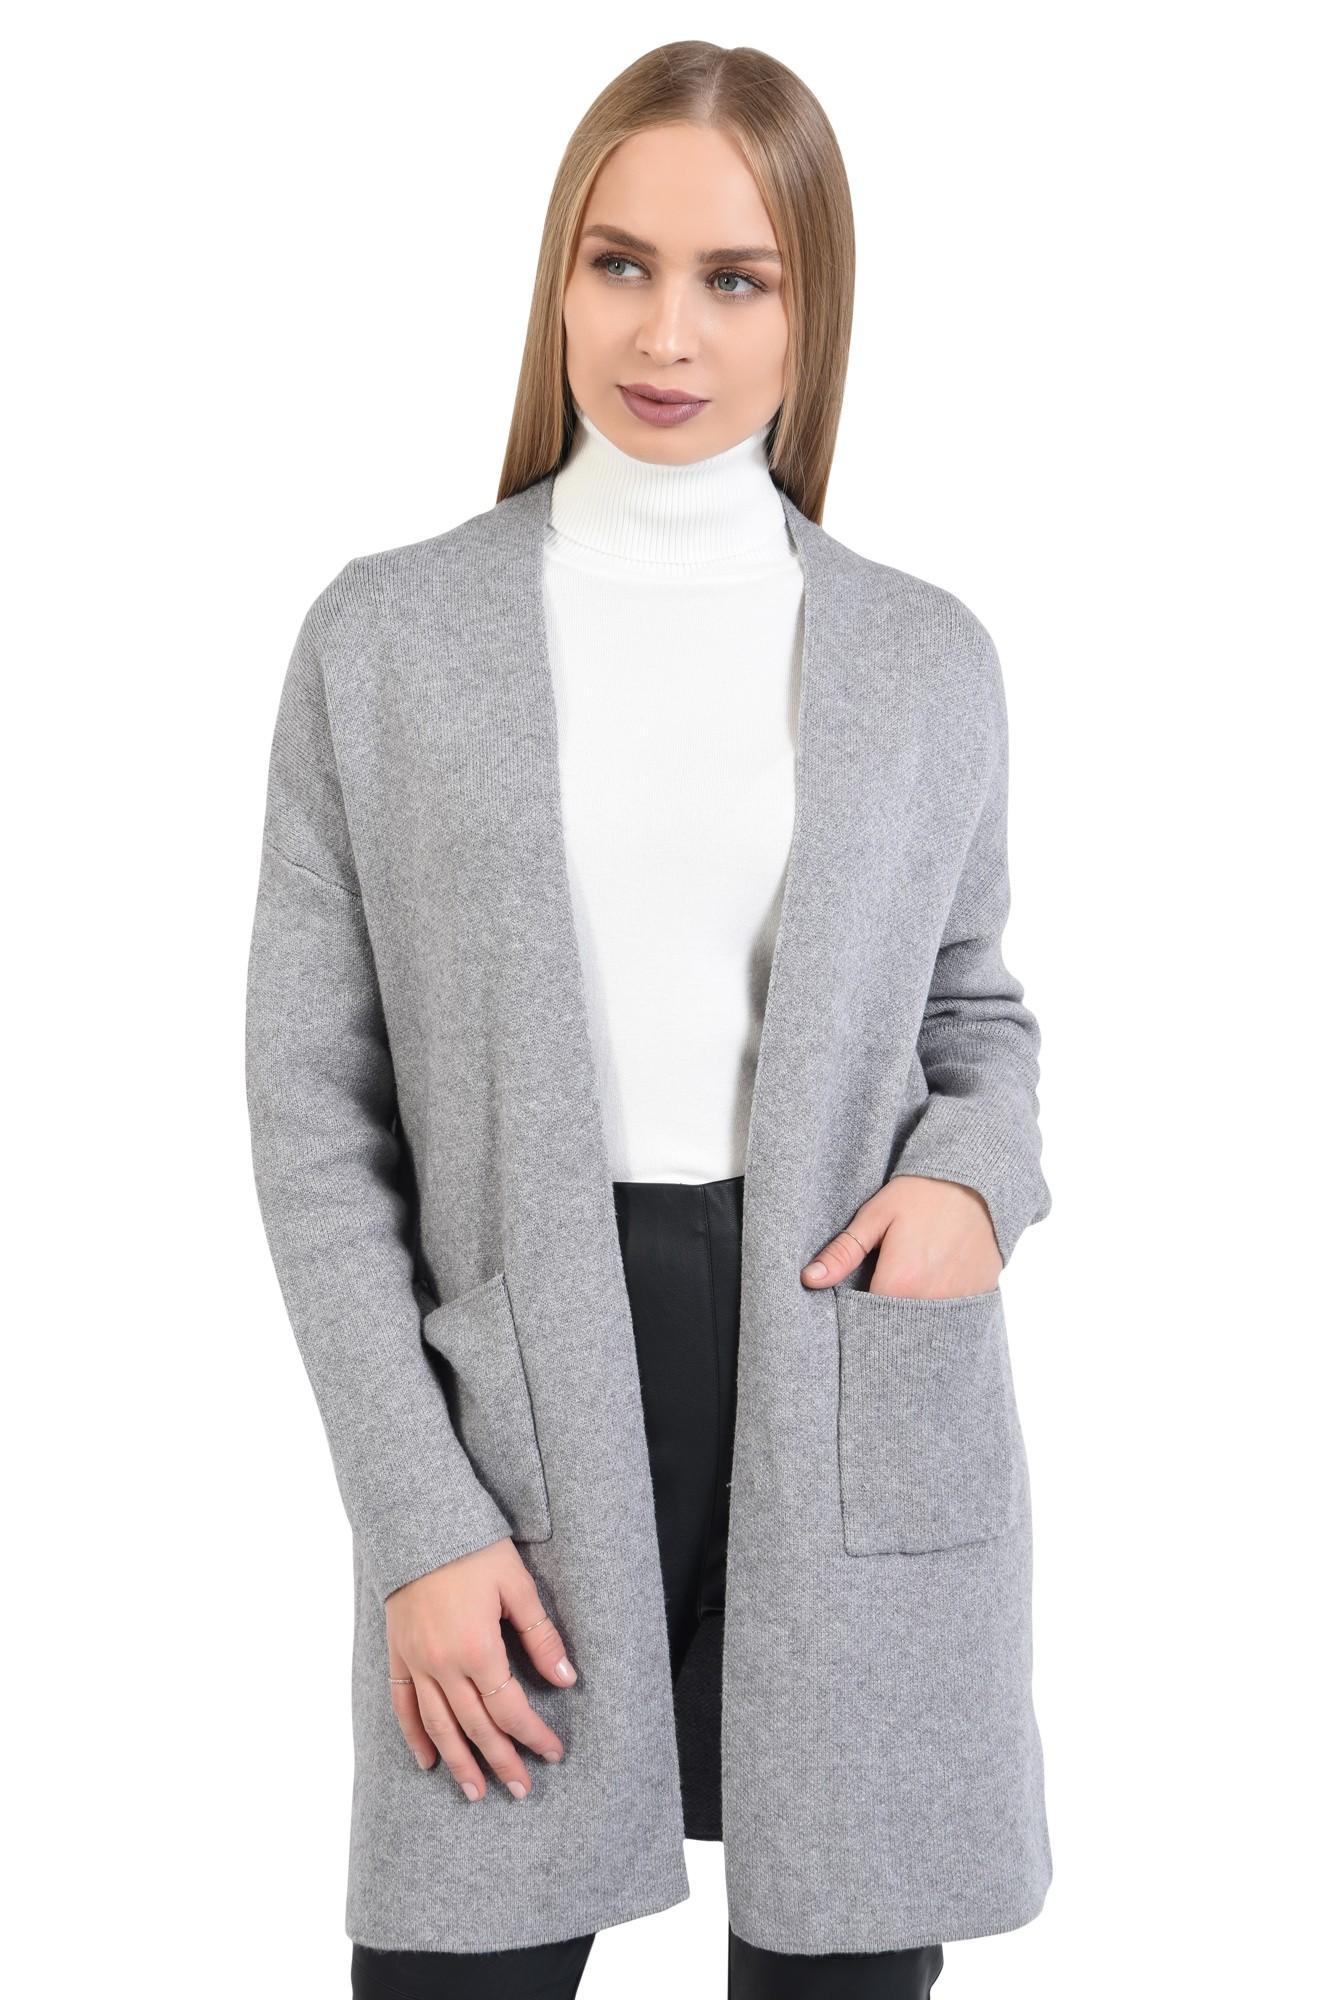 2 - pulover gri, jacheta de toamna, croi drept lejer